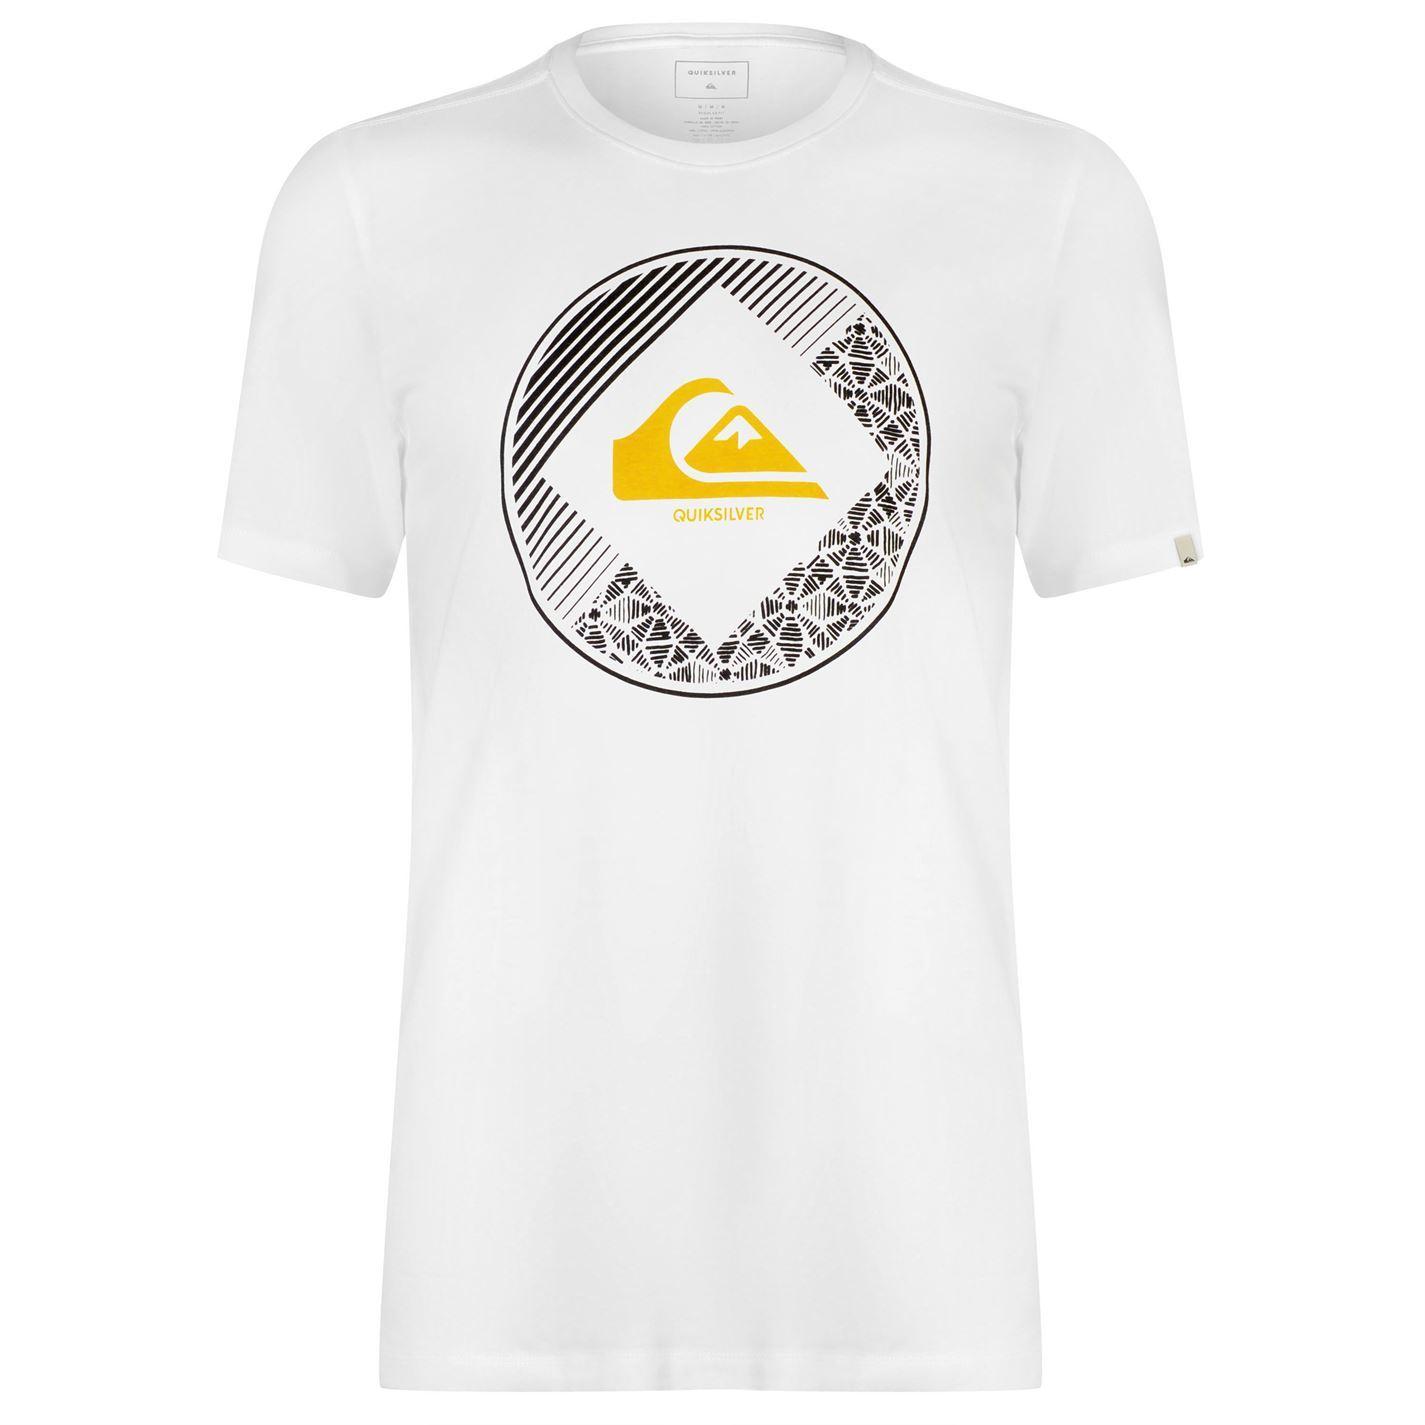 Quiksilver-Diamond-Logo-T-Shirt-Mens-Top-Tee-Shirt-White-Small thumbnail 9